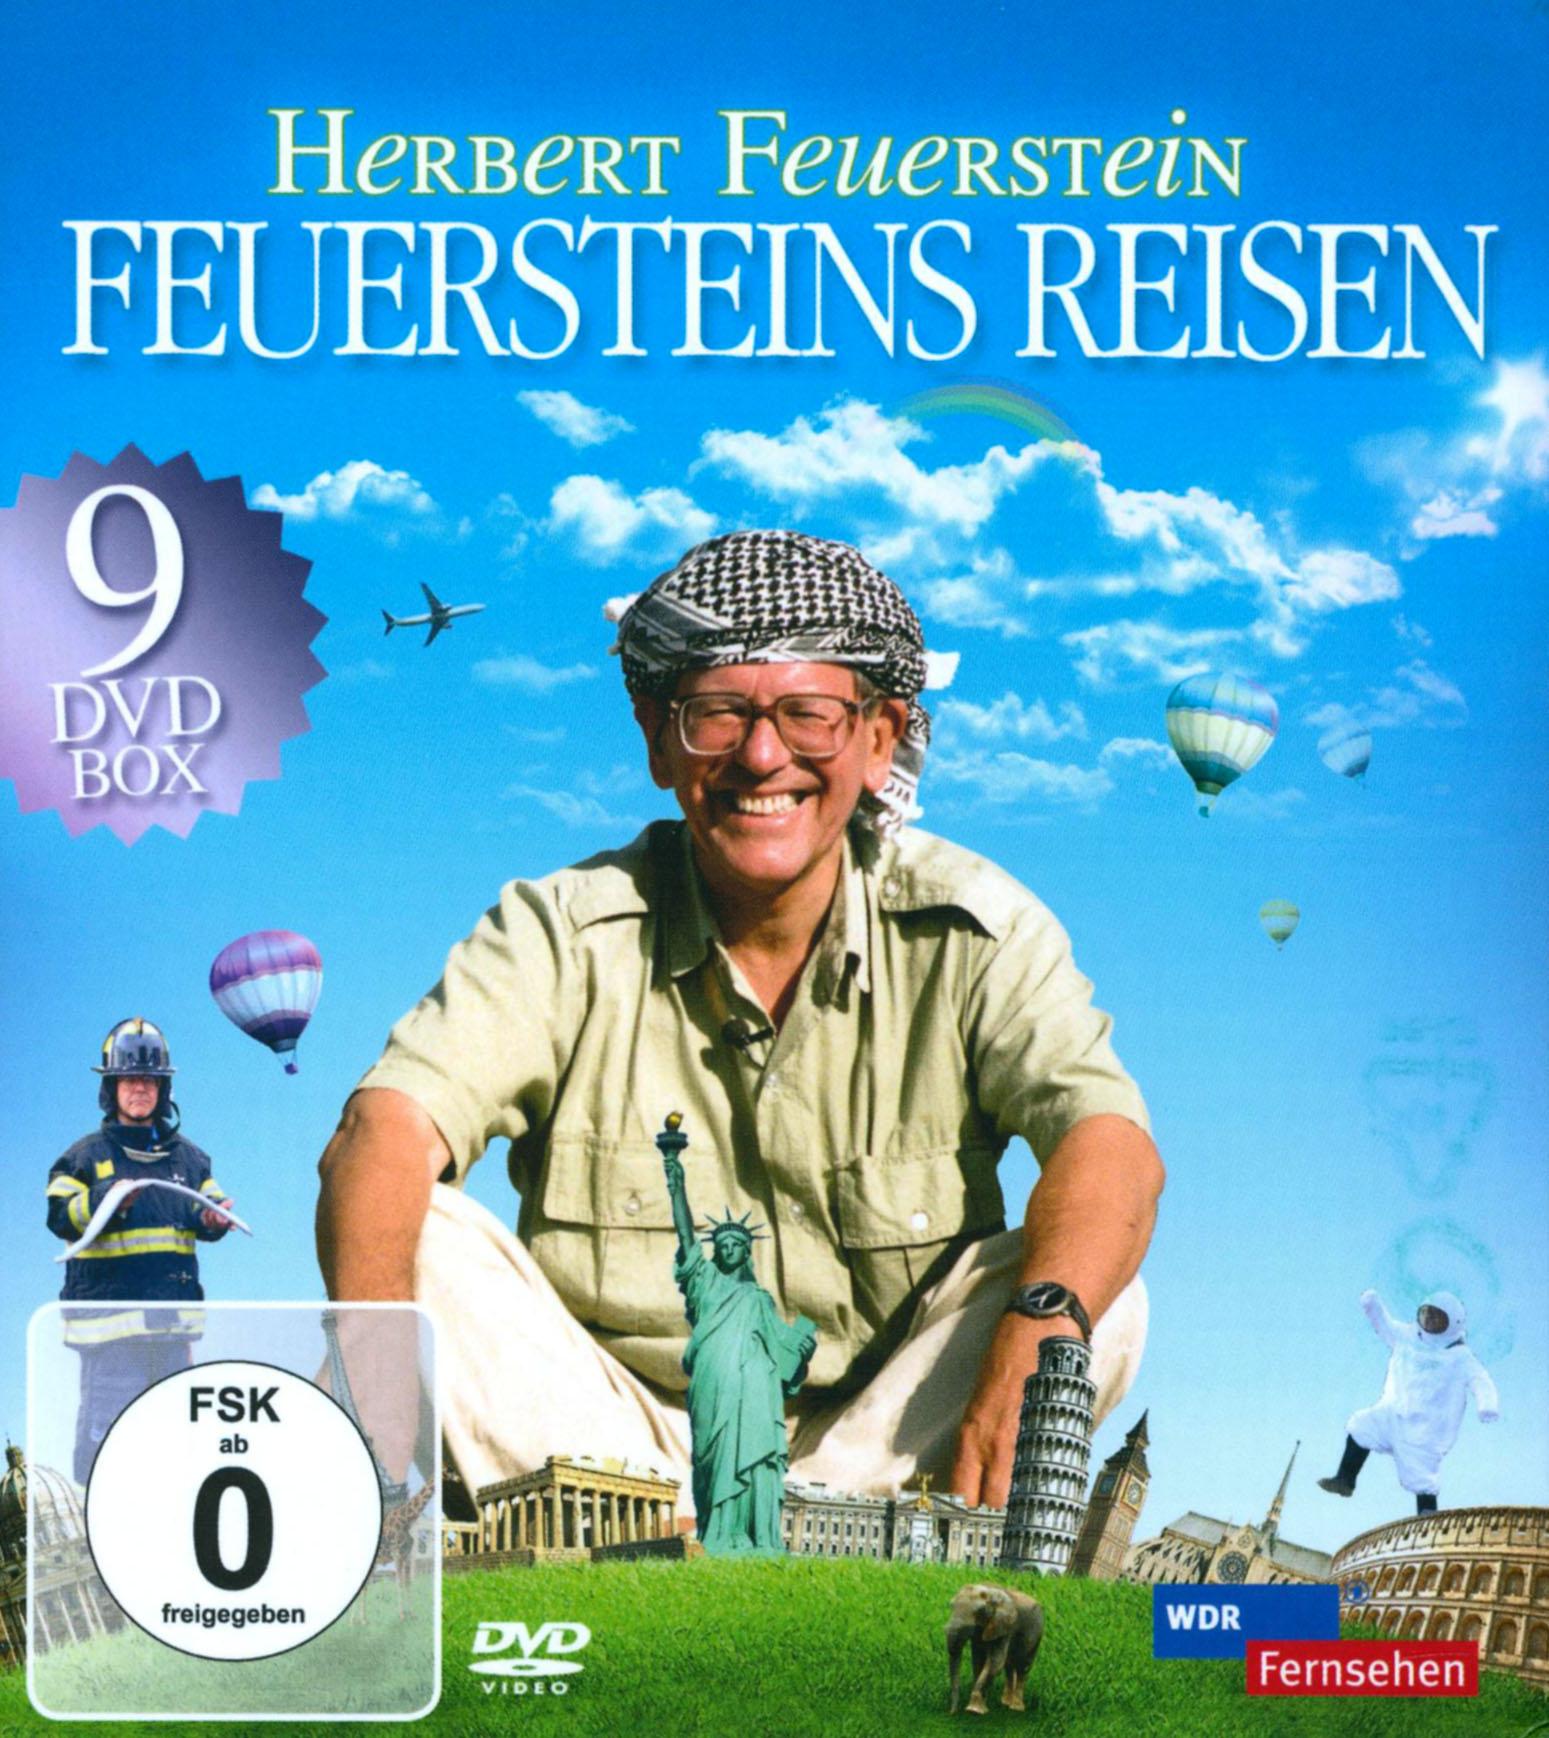 Herbert Feuerstein: Feuersteins Reisen